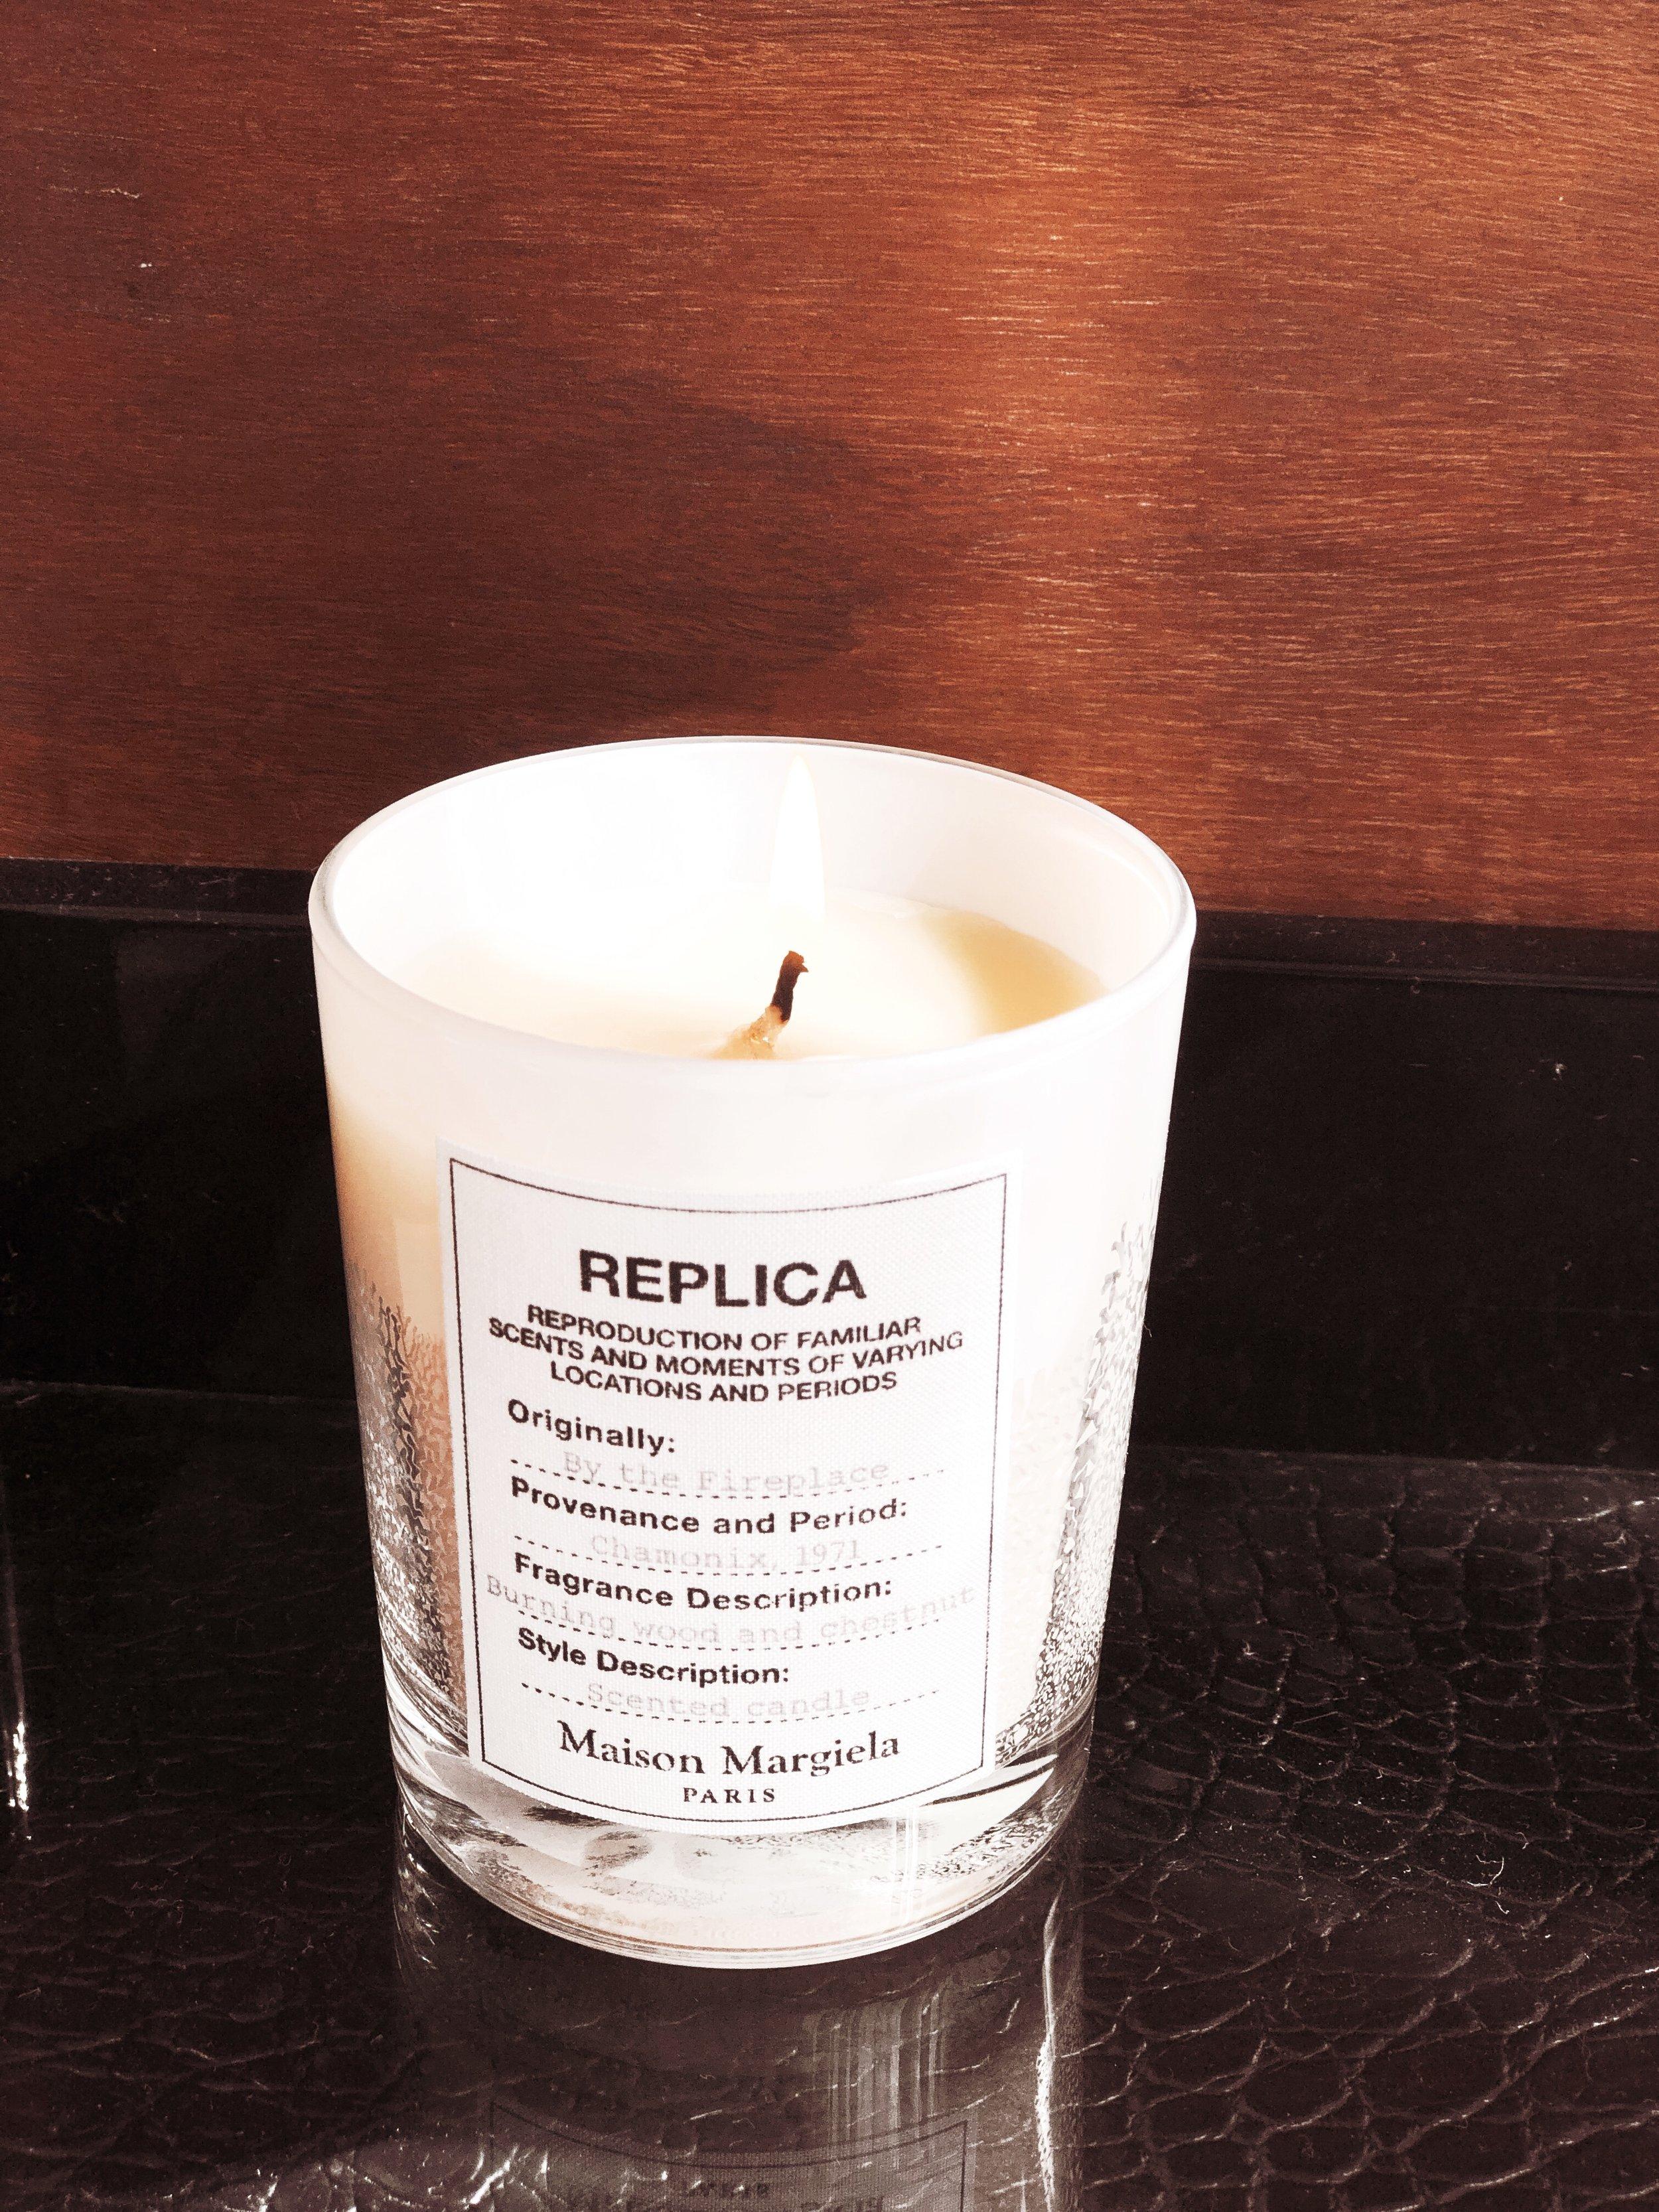 july 2019 lolla winter candles velas favoritas inverno replica maison margiela firplace lolla - Winter Candles: Minhas velas favoritas para o inverno